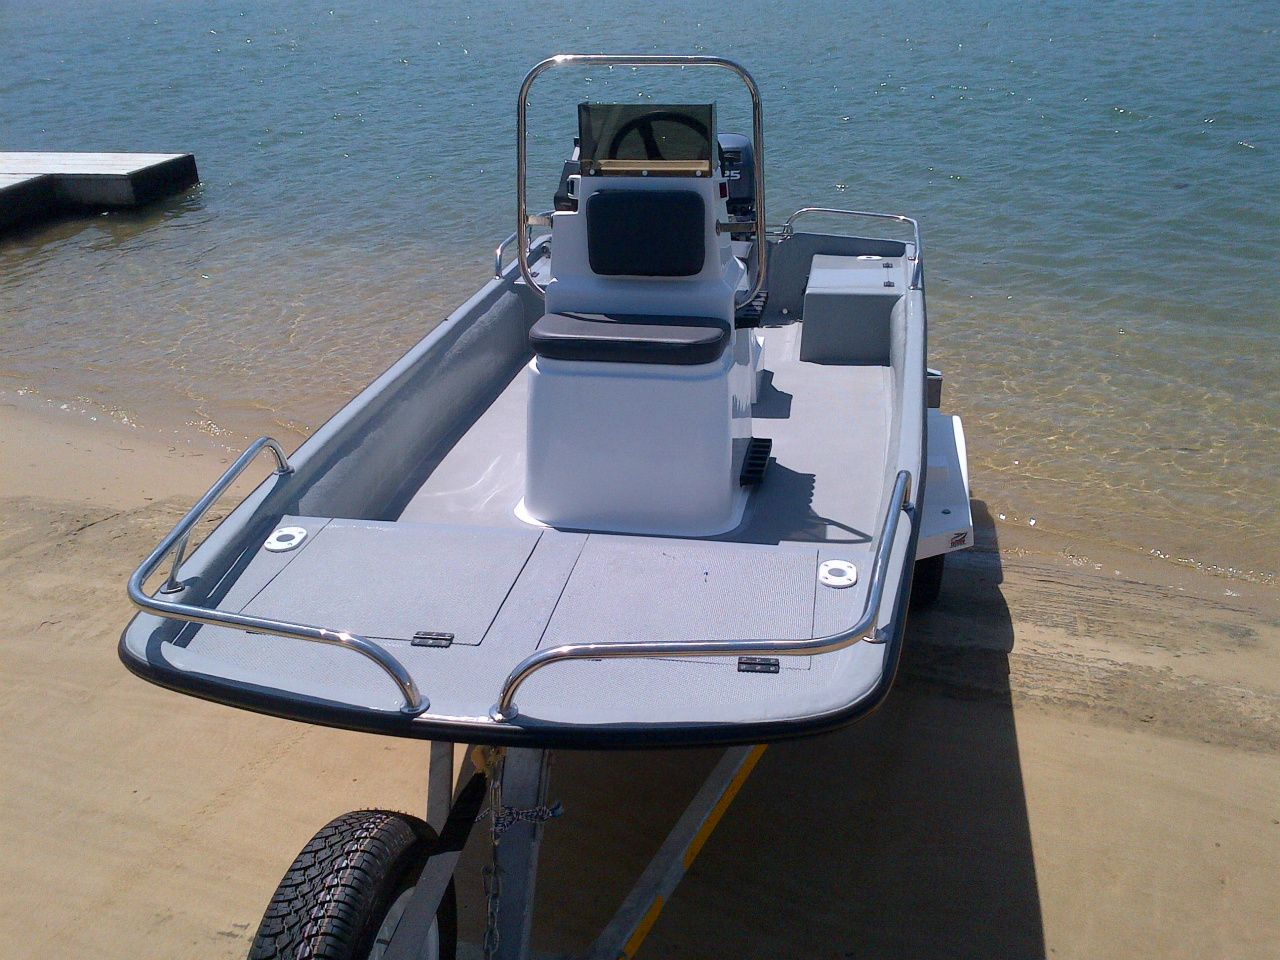 BANDIT 380 | The Boathouse | Utility boat, Boat, Wooden ...